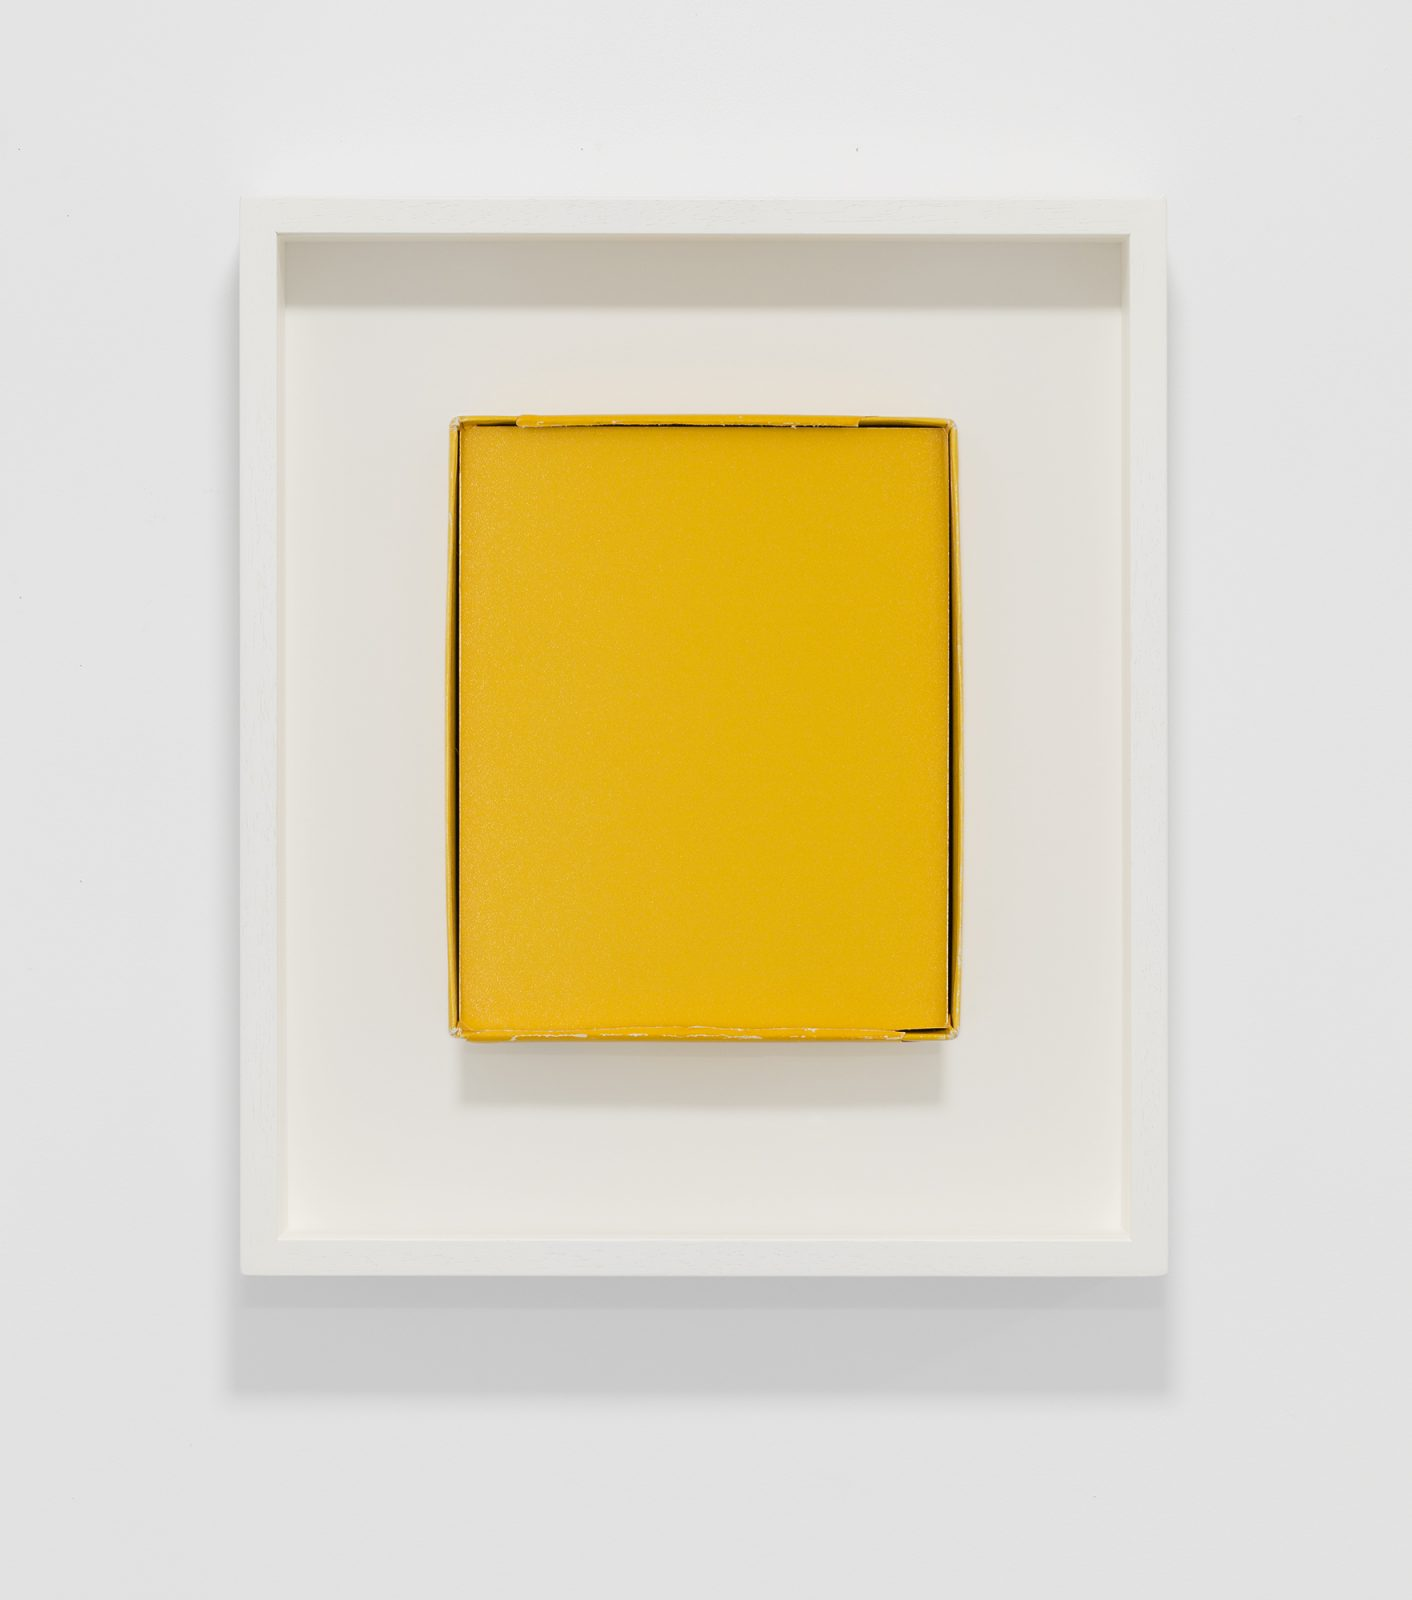 Shaun Waugh featured artwork